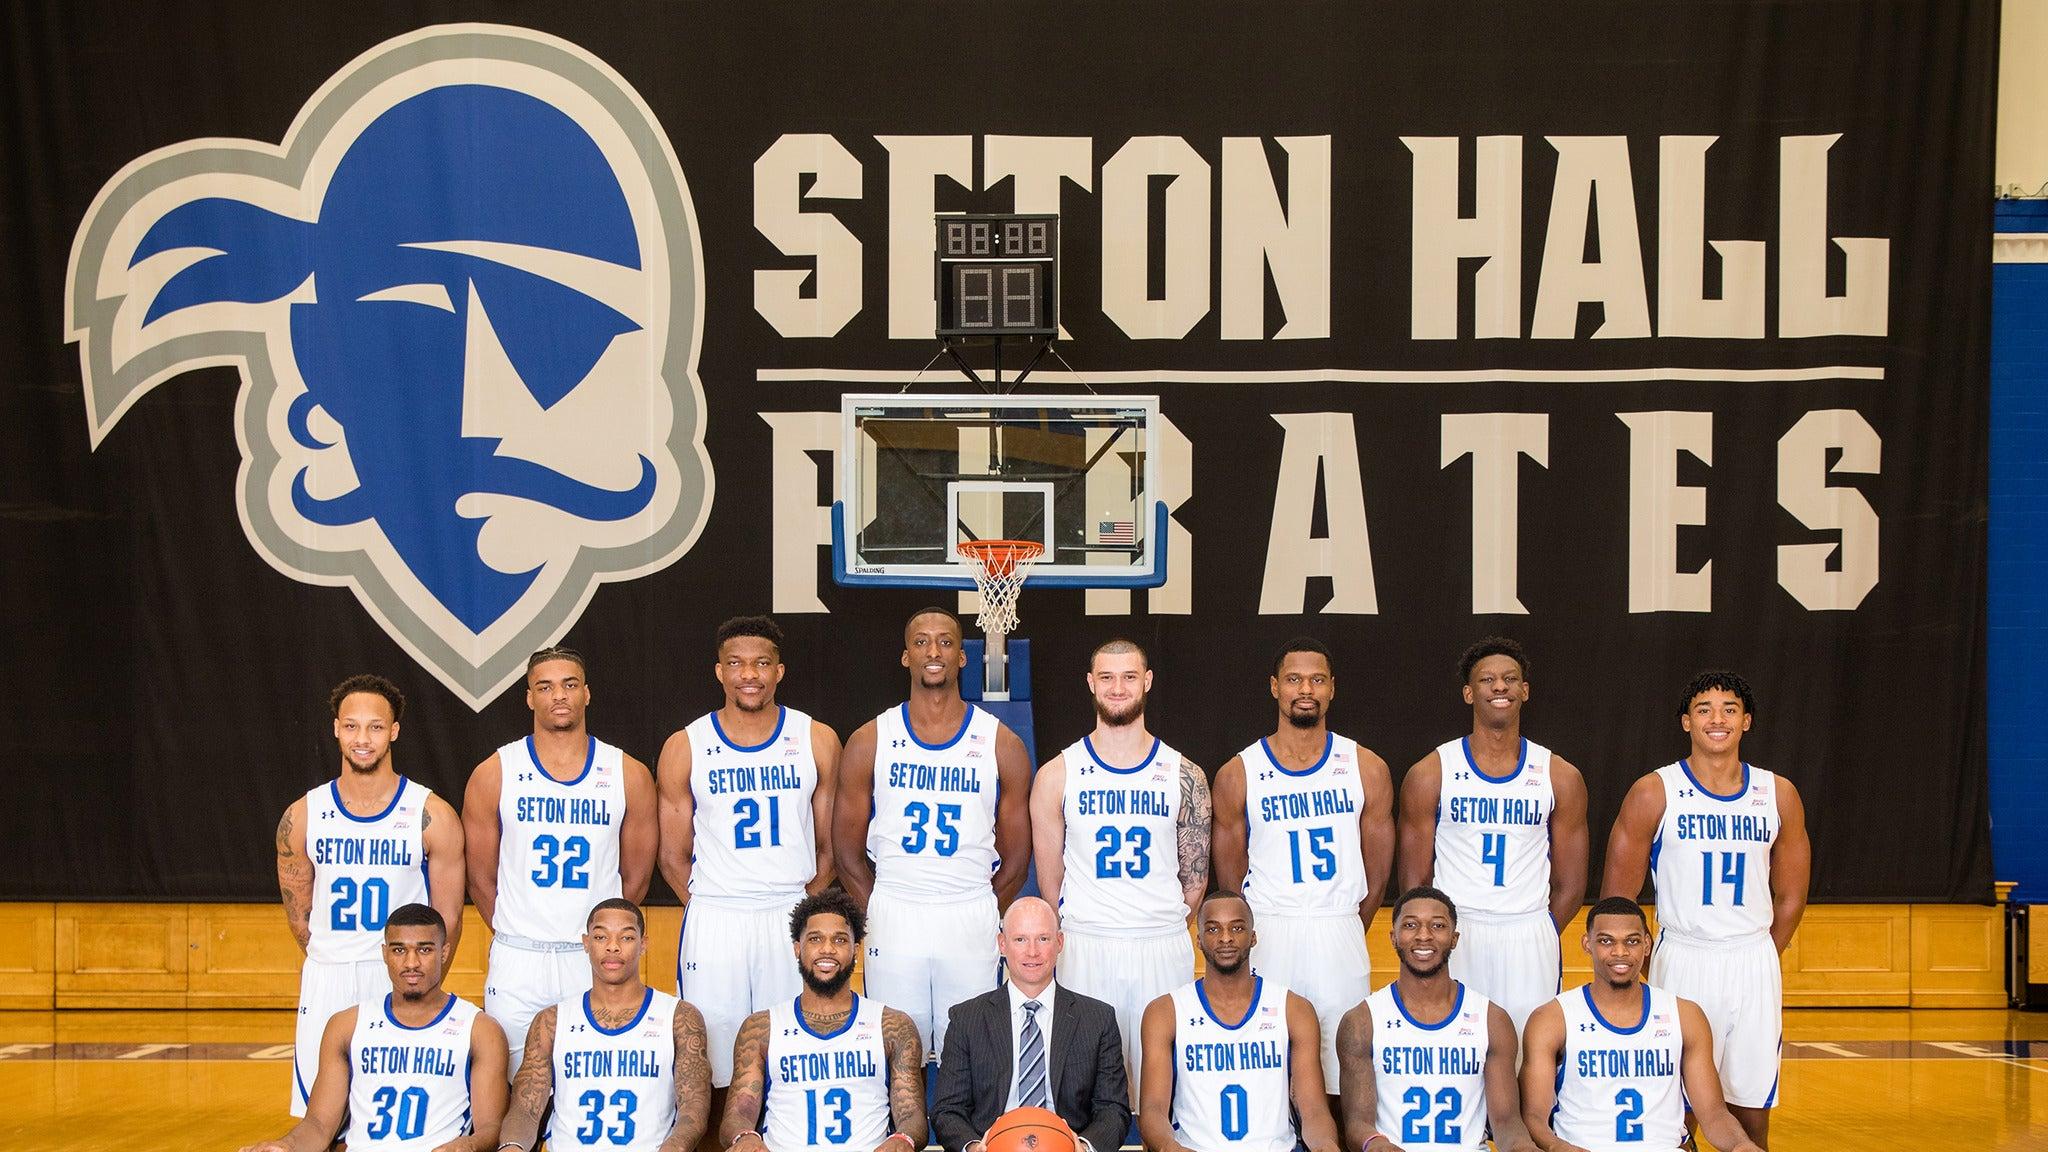 Seton Hall Pirates Men's Basketball vs. Michigan State University Men's Basketball